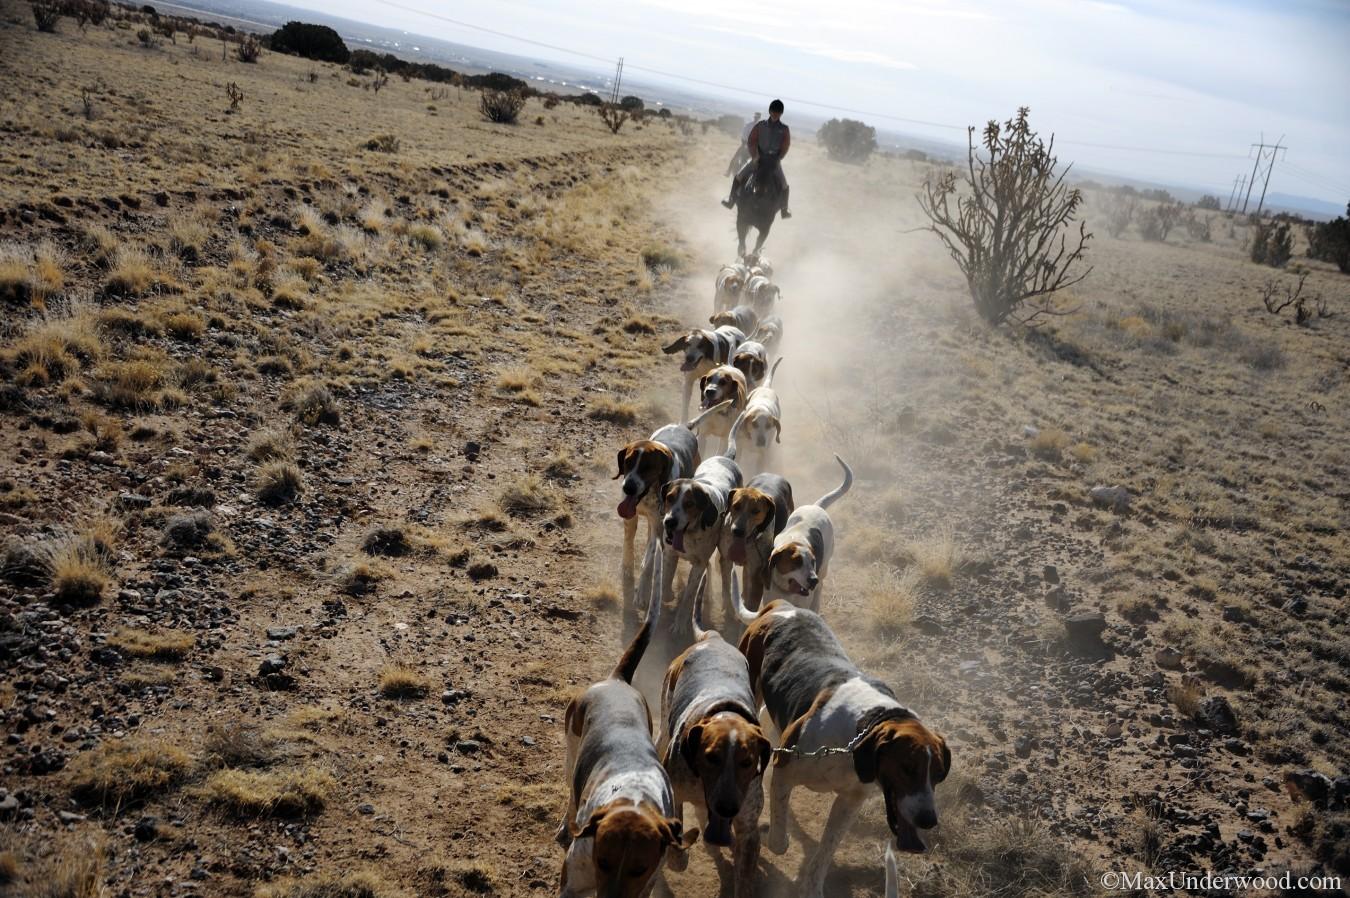 Caza Ladron Fox Hunt, cubbing run. Fox hounds and horses running, Santa Fe, NM.